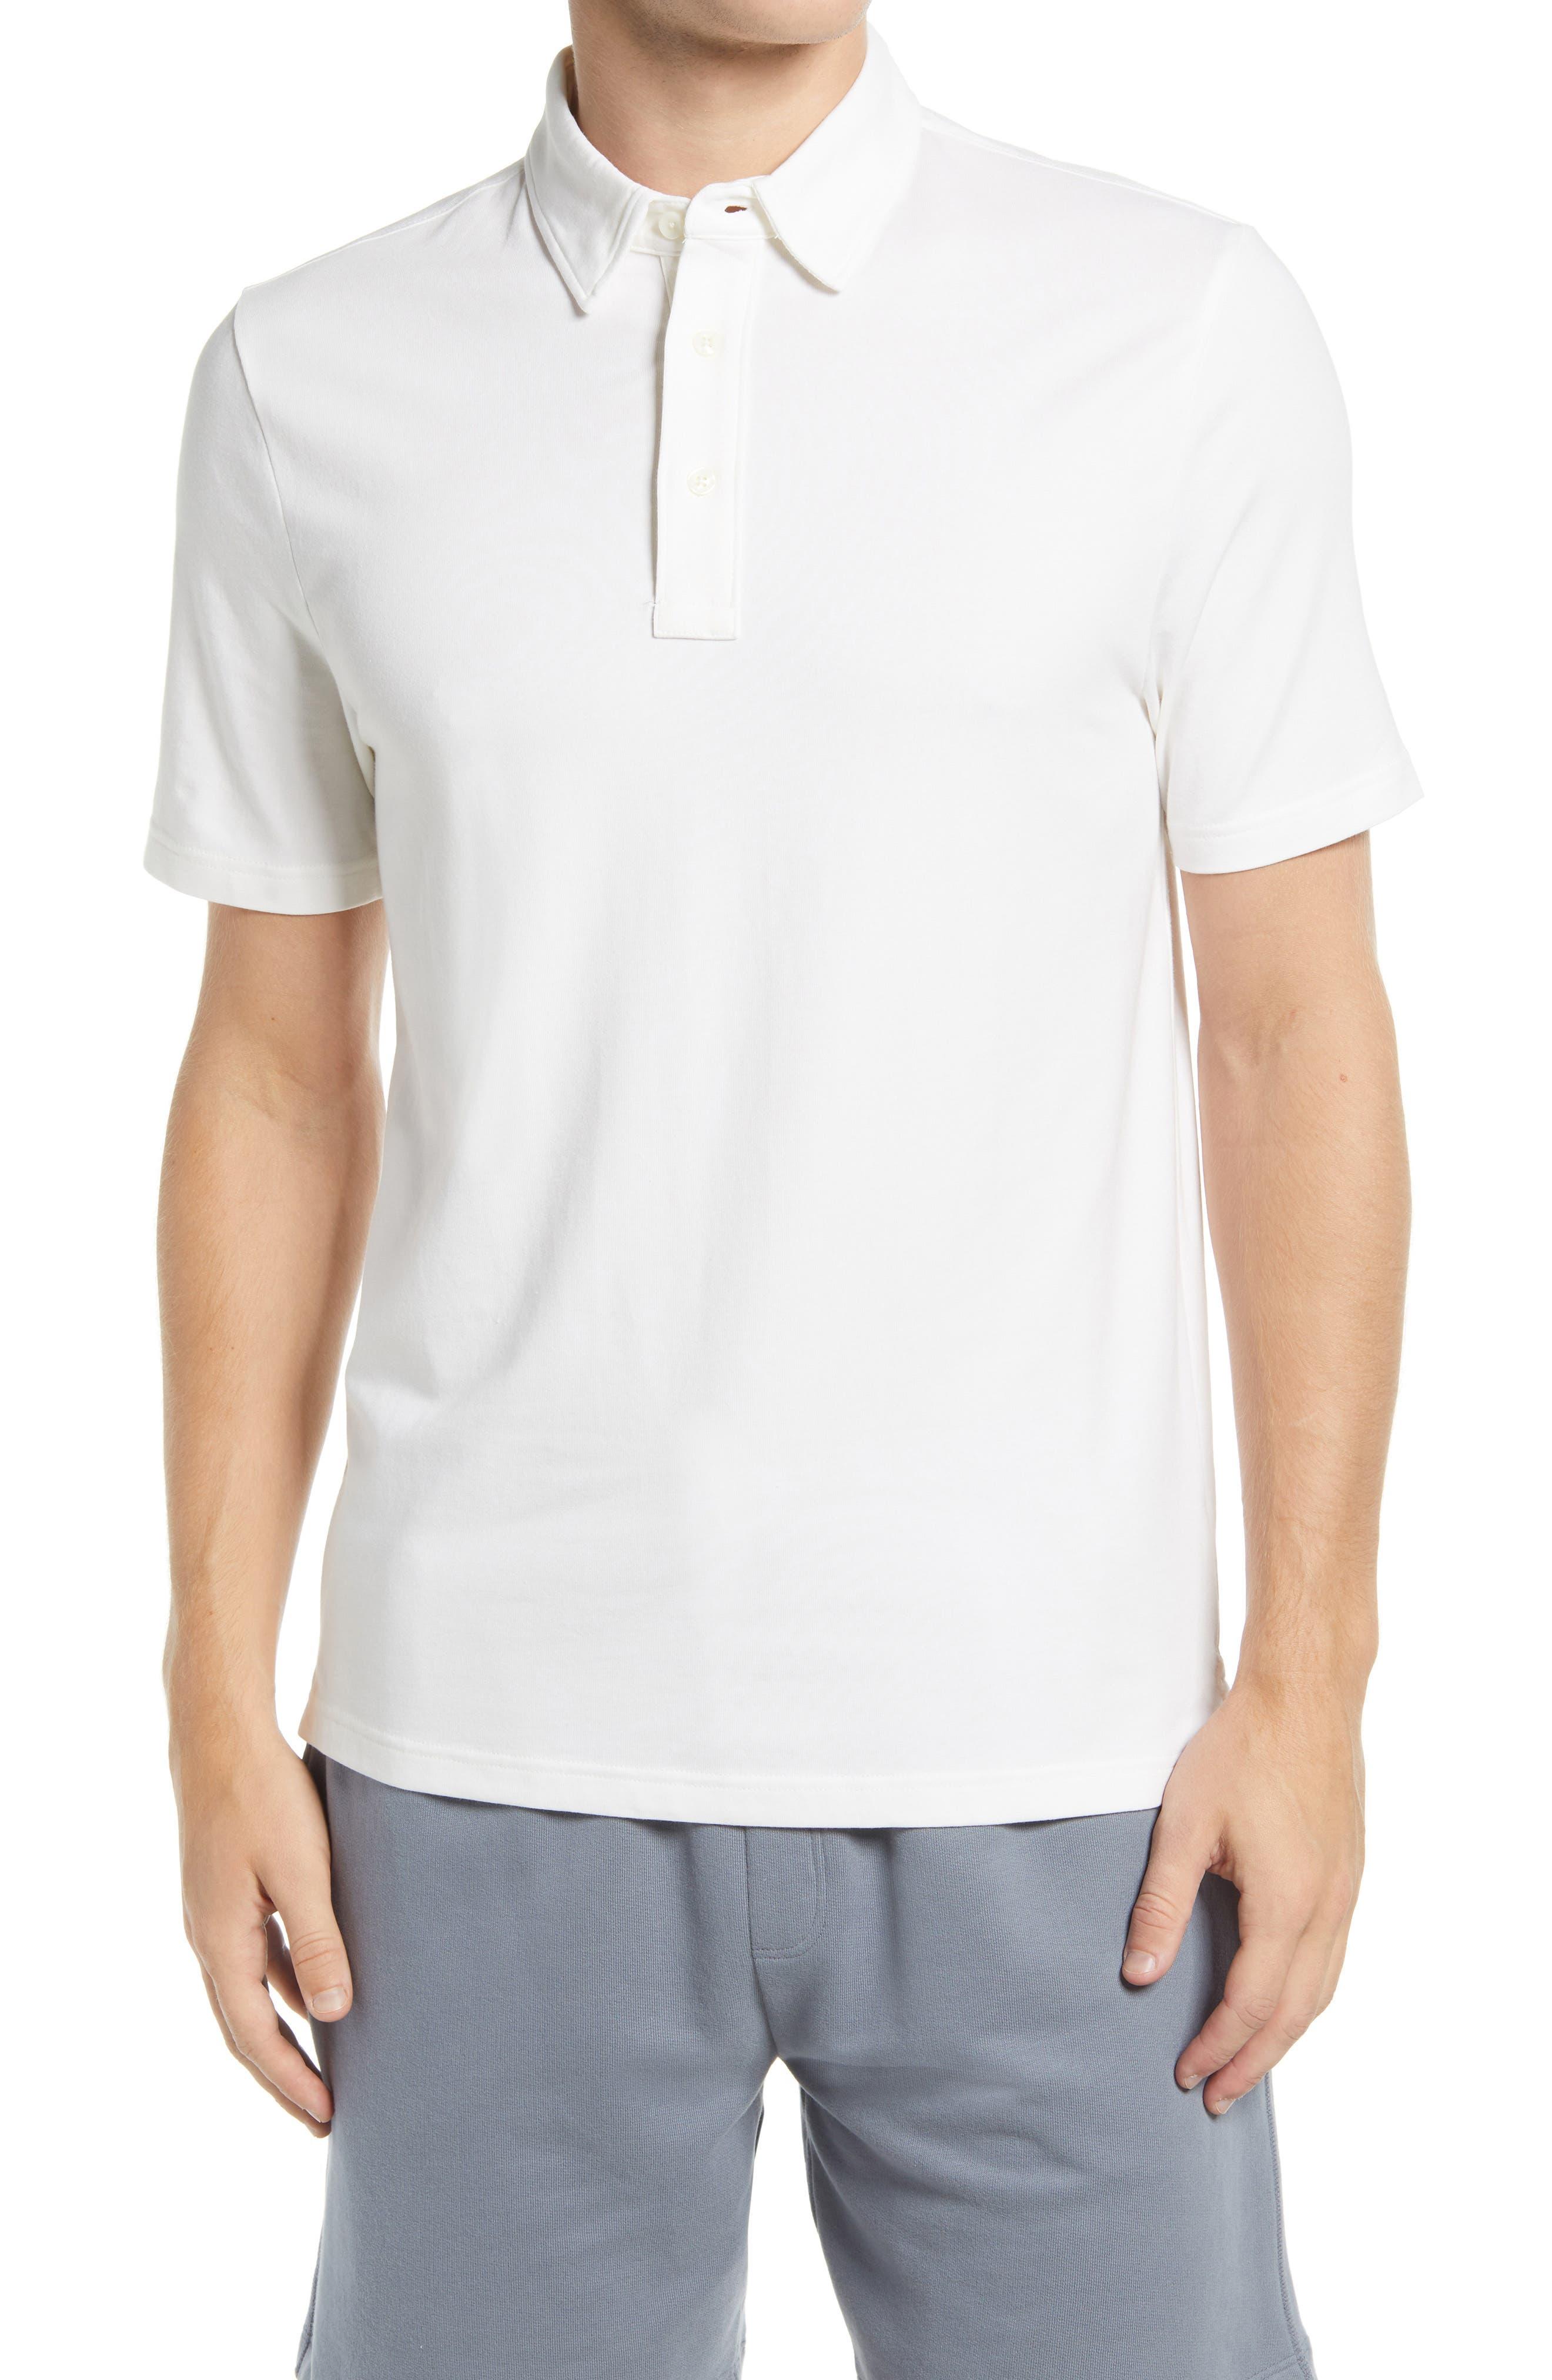 Movement Short Sleeve Polo Shirt